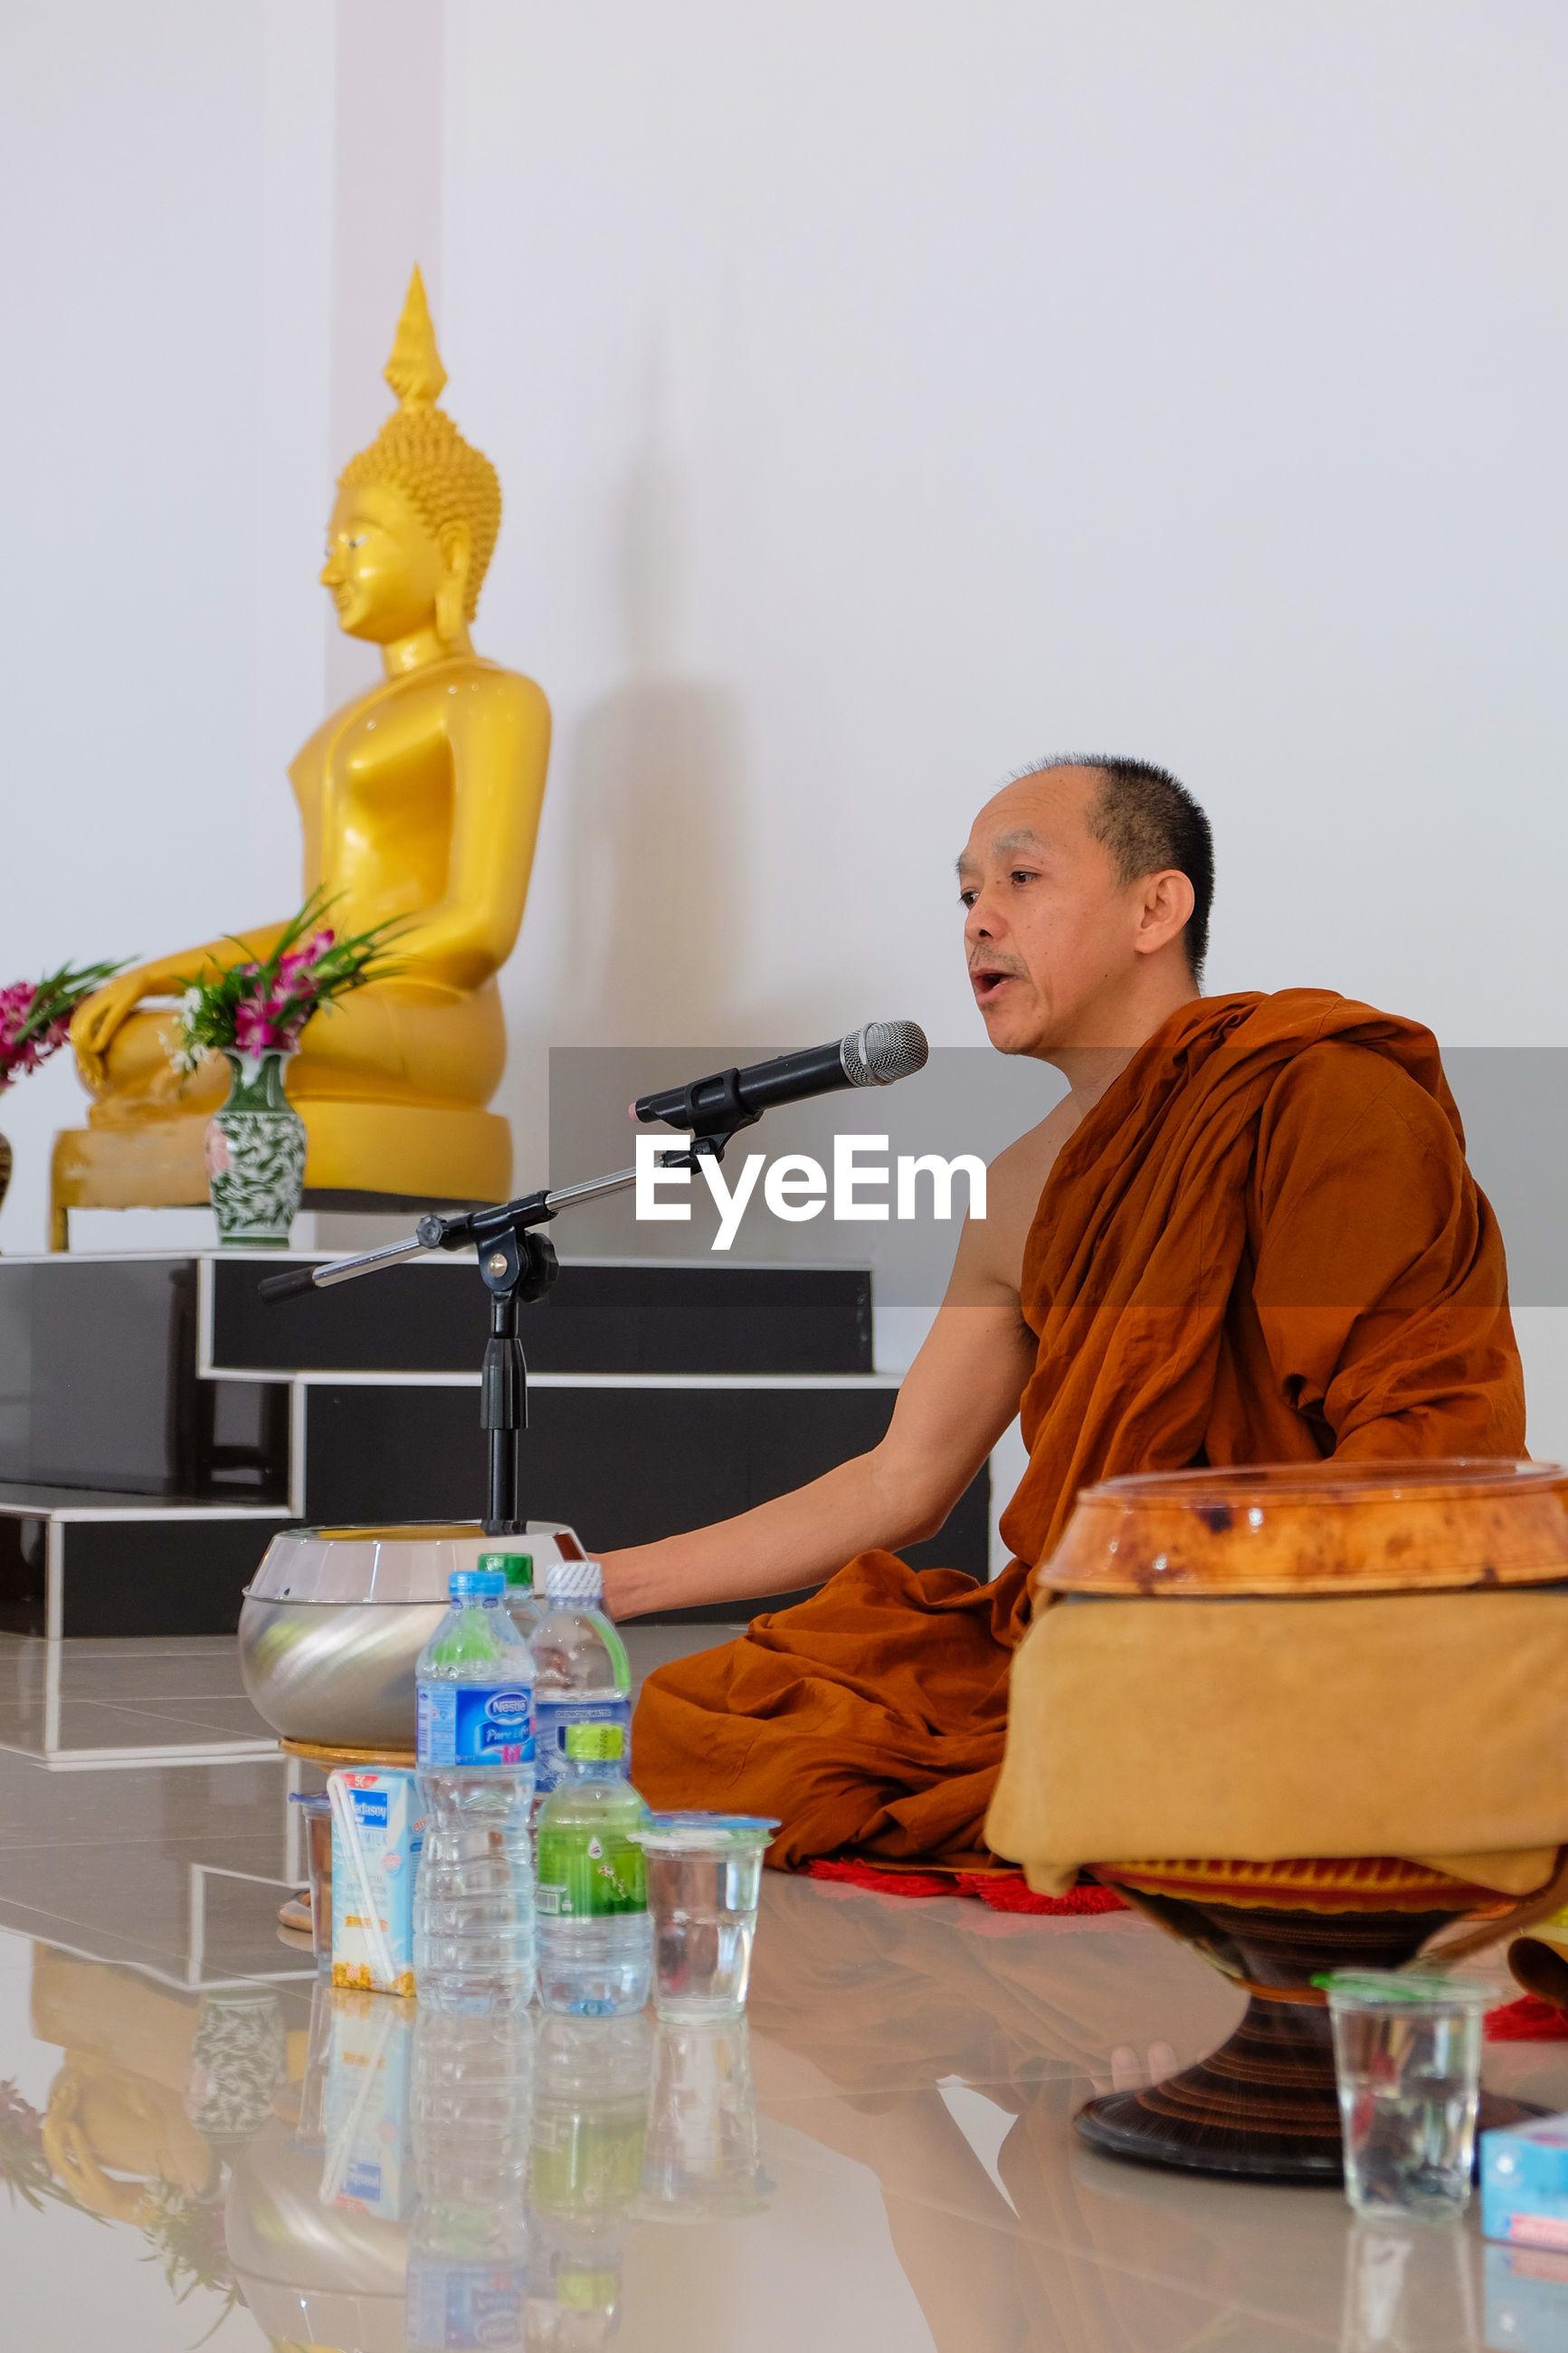 indoors, religion, buddha, spirituality, sitting, casual clothing, person, arrangement, domestic life, place of worship, large